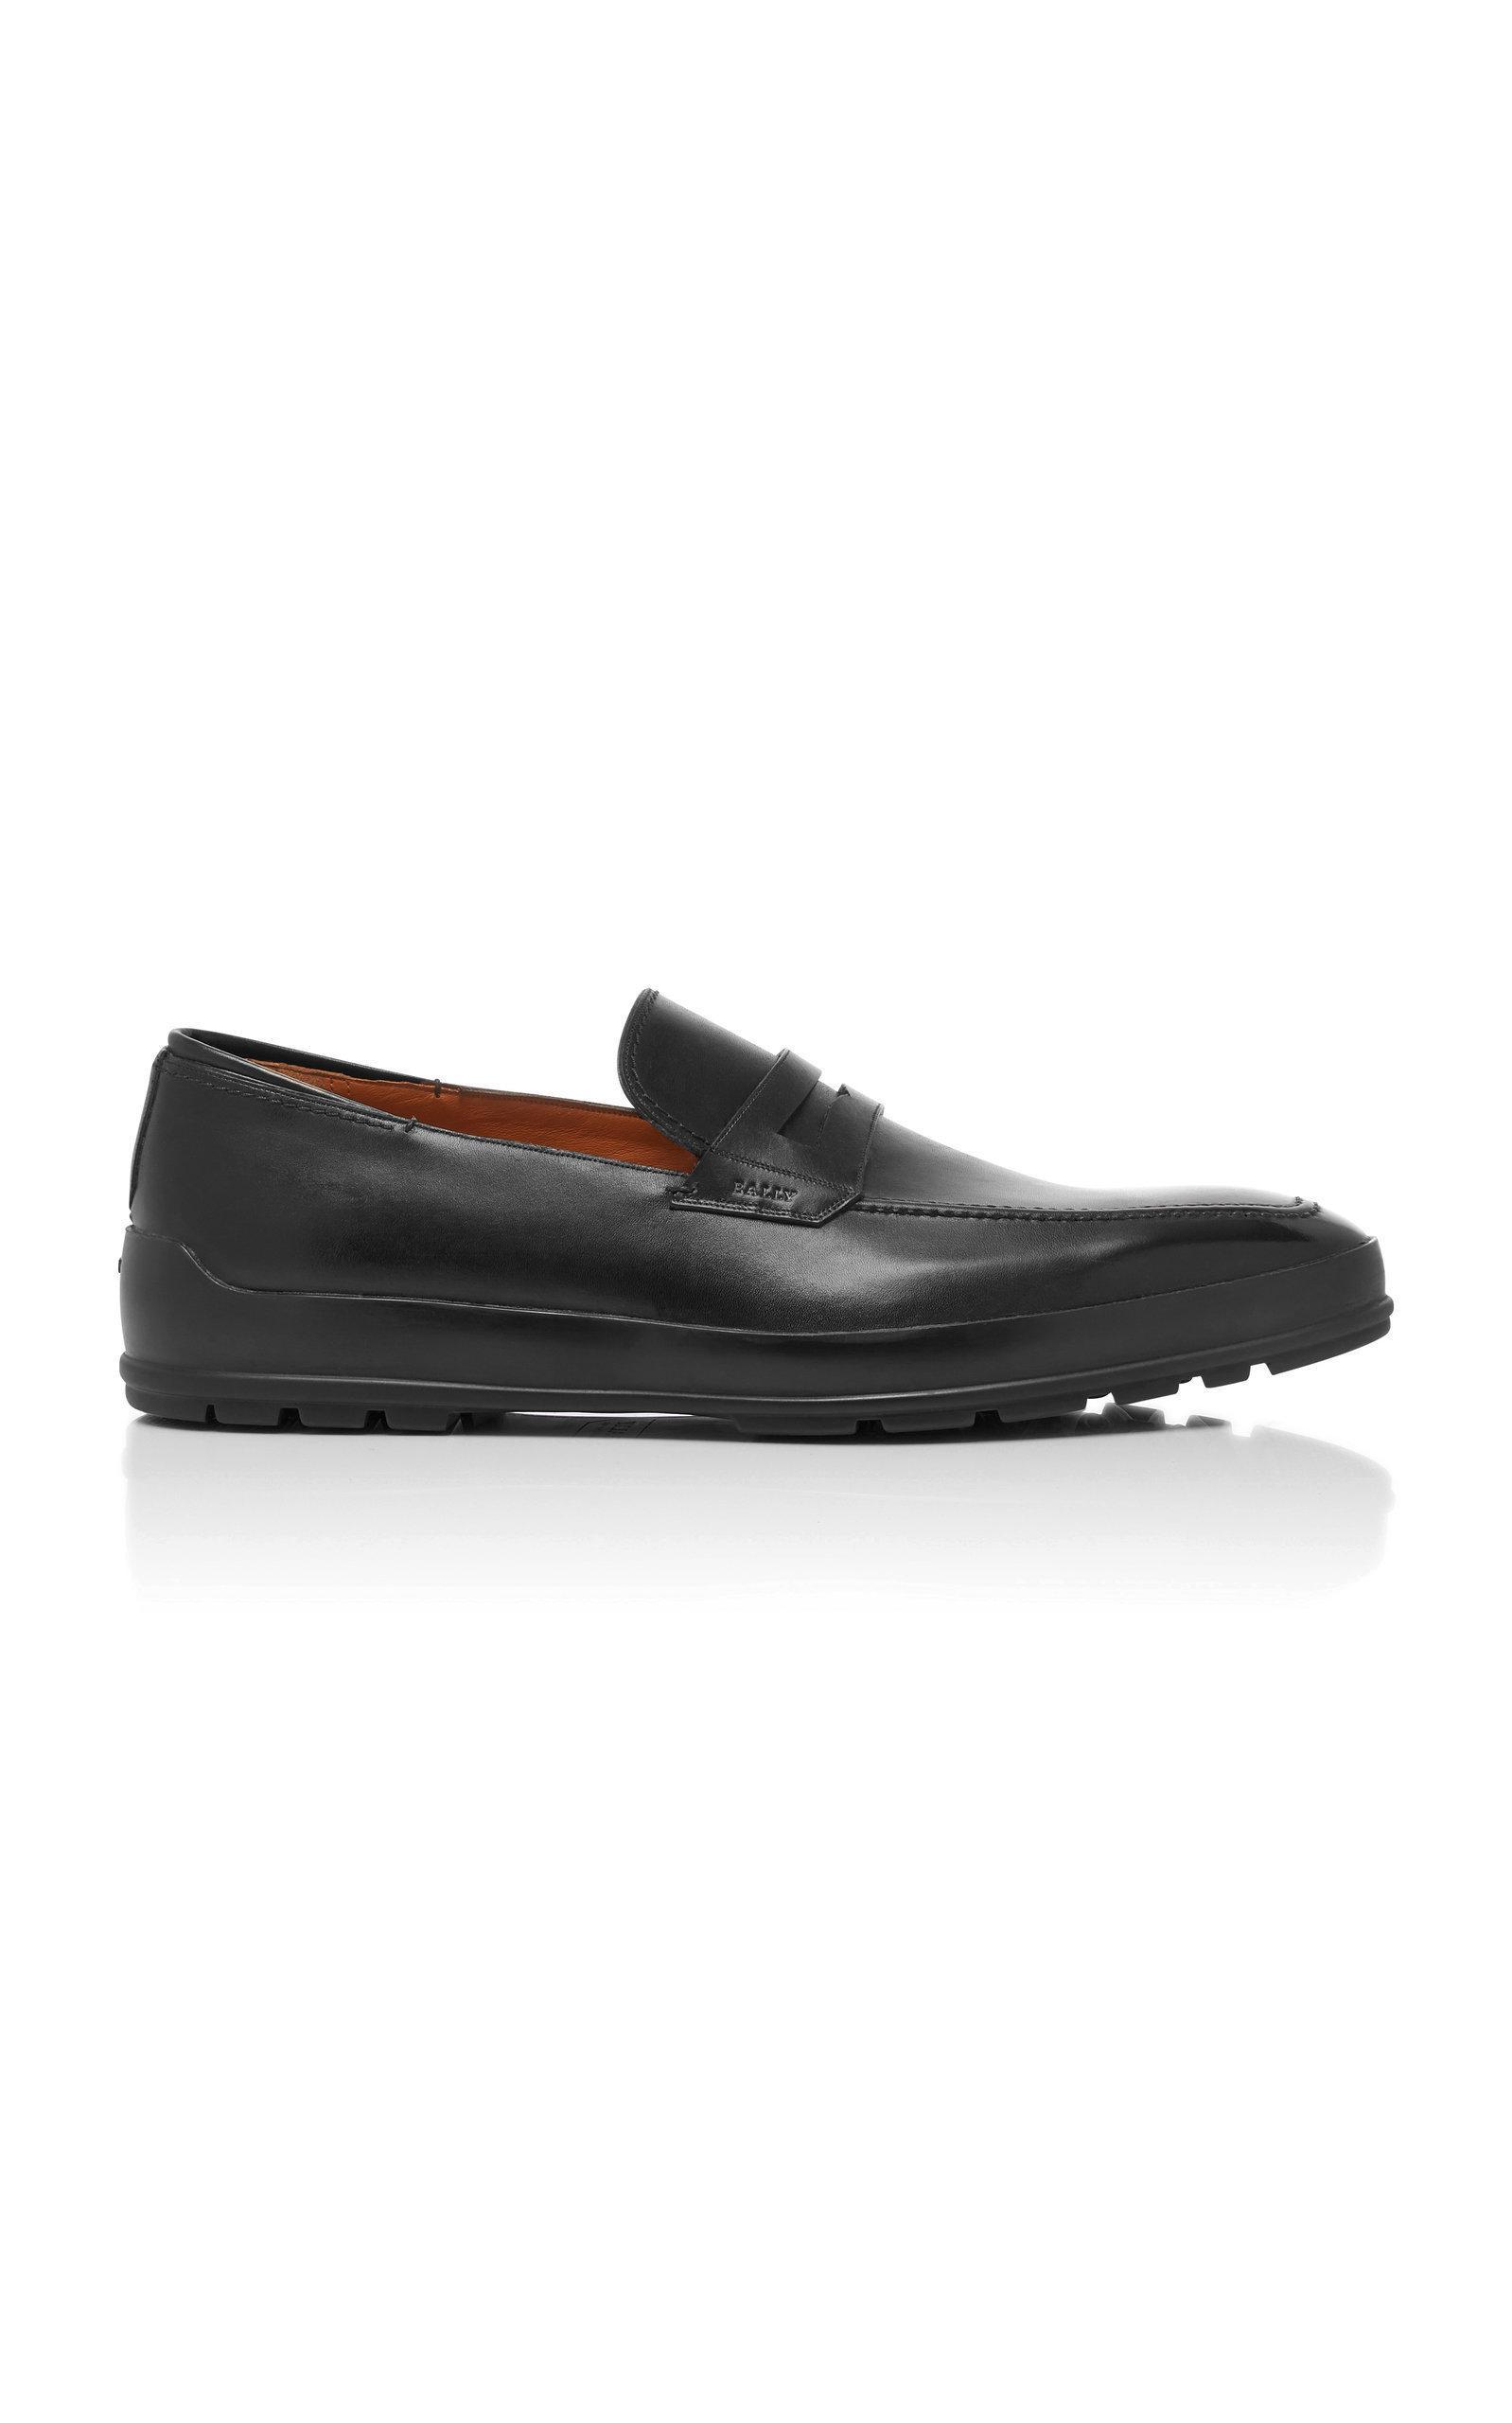 5aa05011b21 Bally Relon Calfskin Penny Loafers In Black